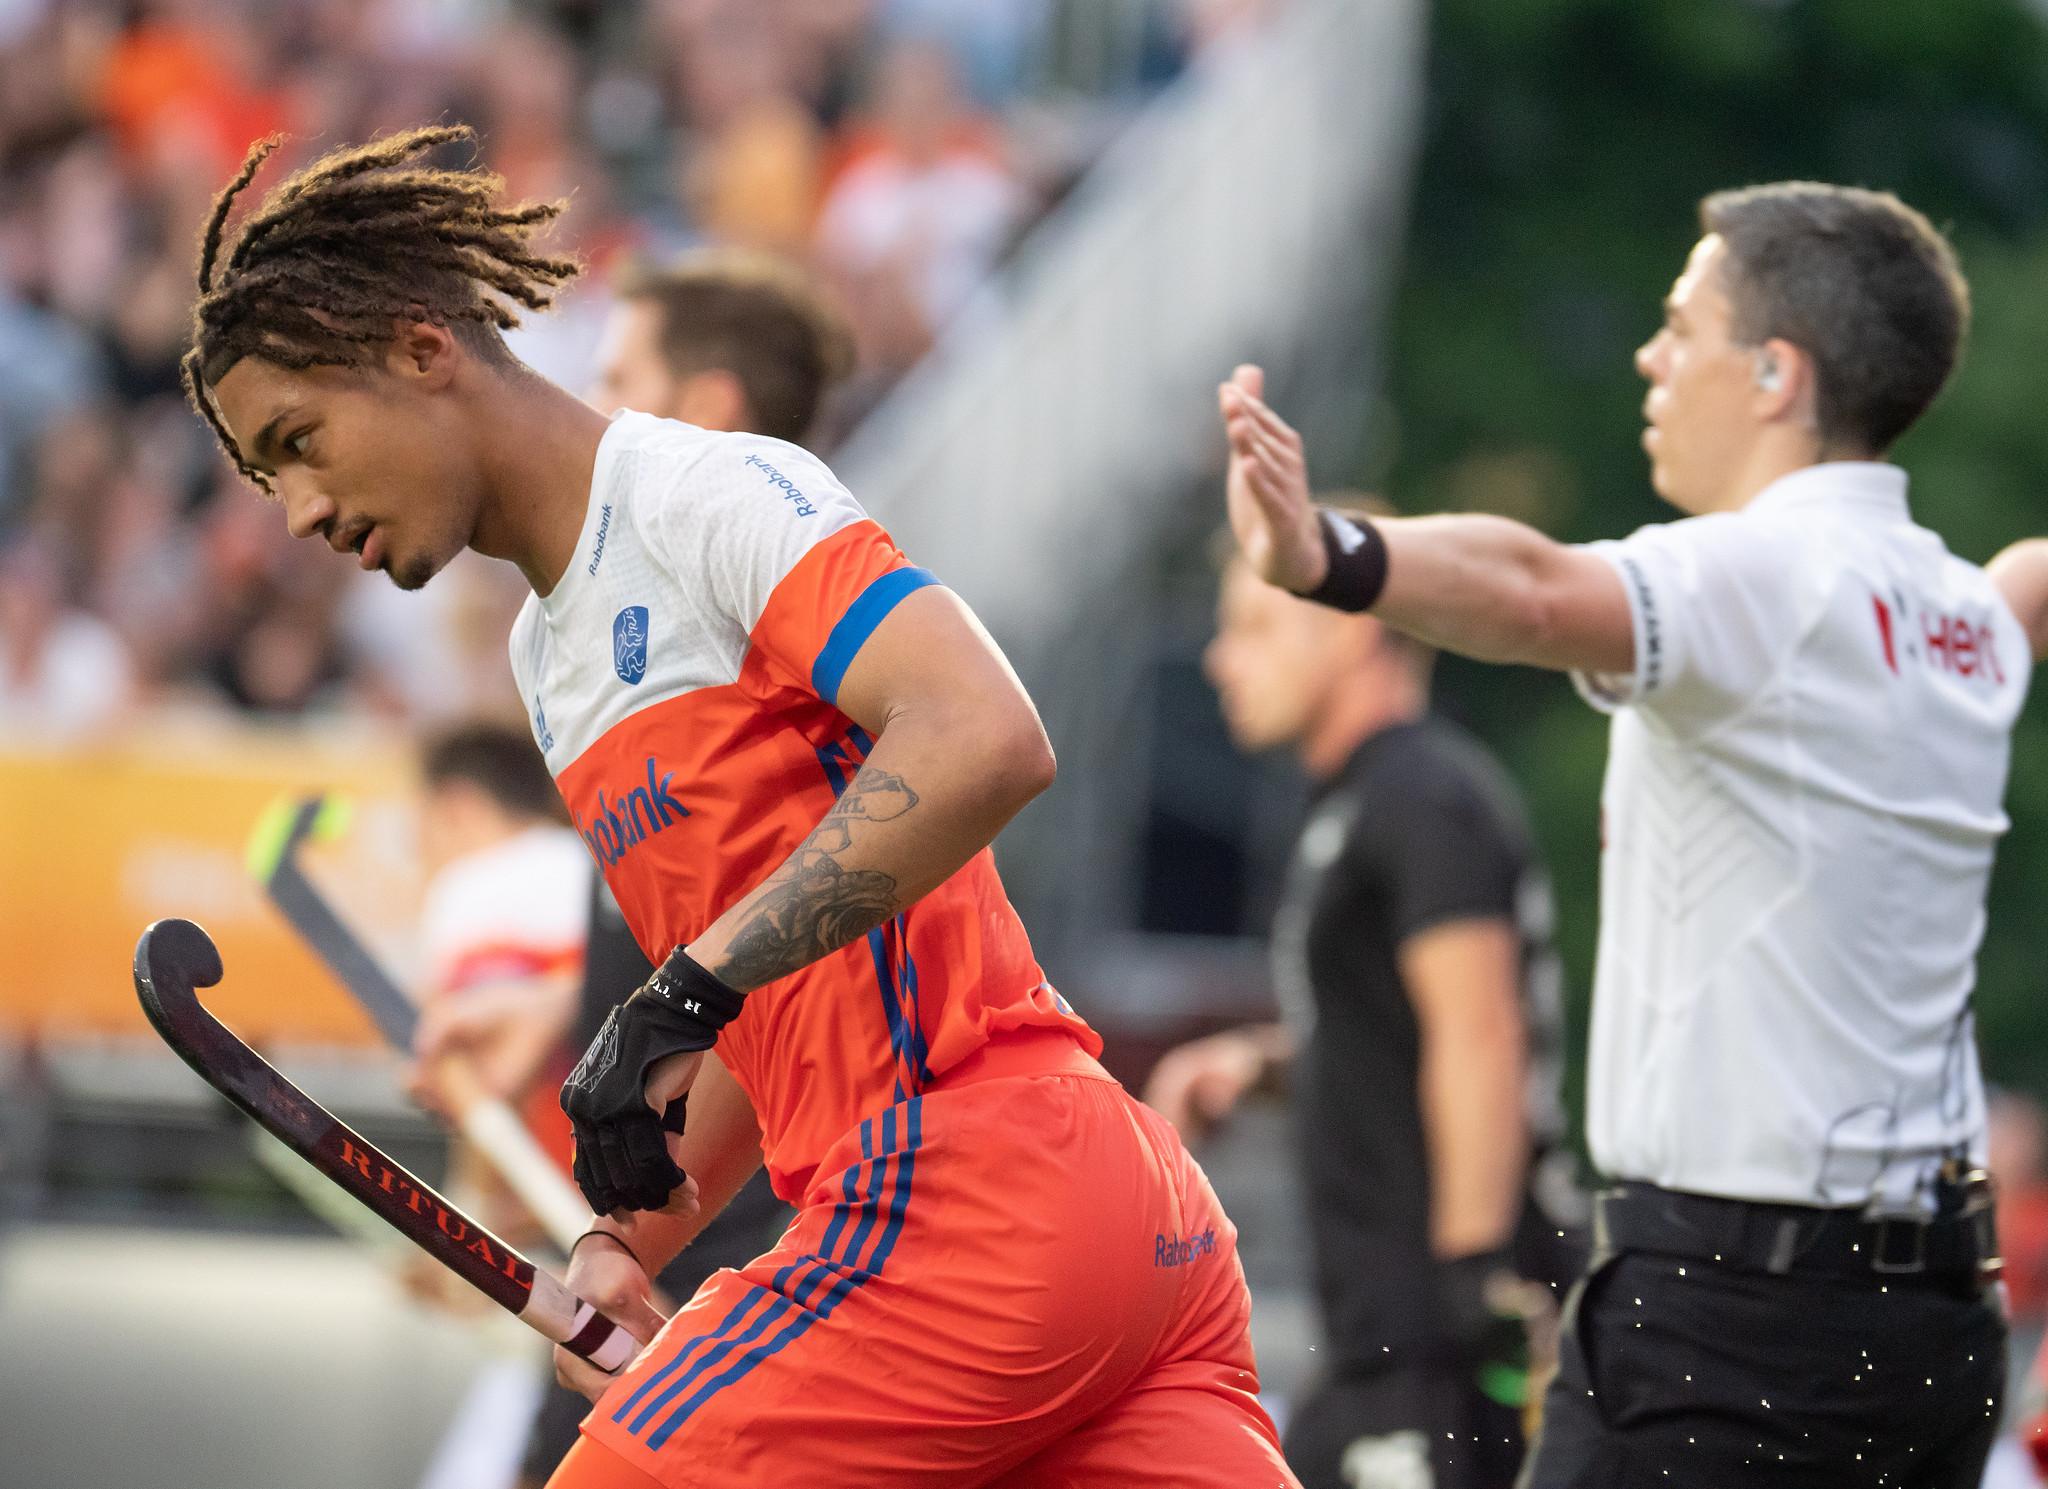 FIH Pro League (H): Nederland wint met shoot-outs van Groot-Brittannie